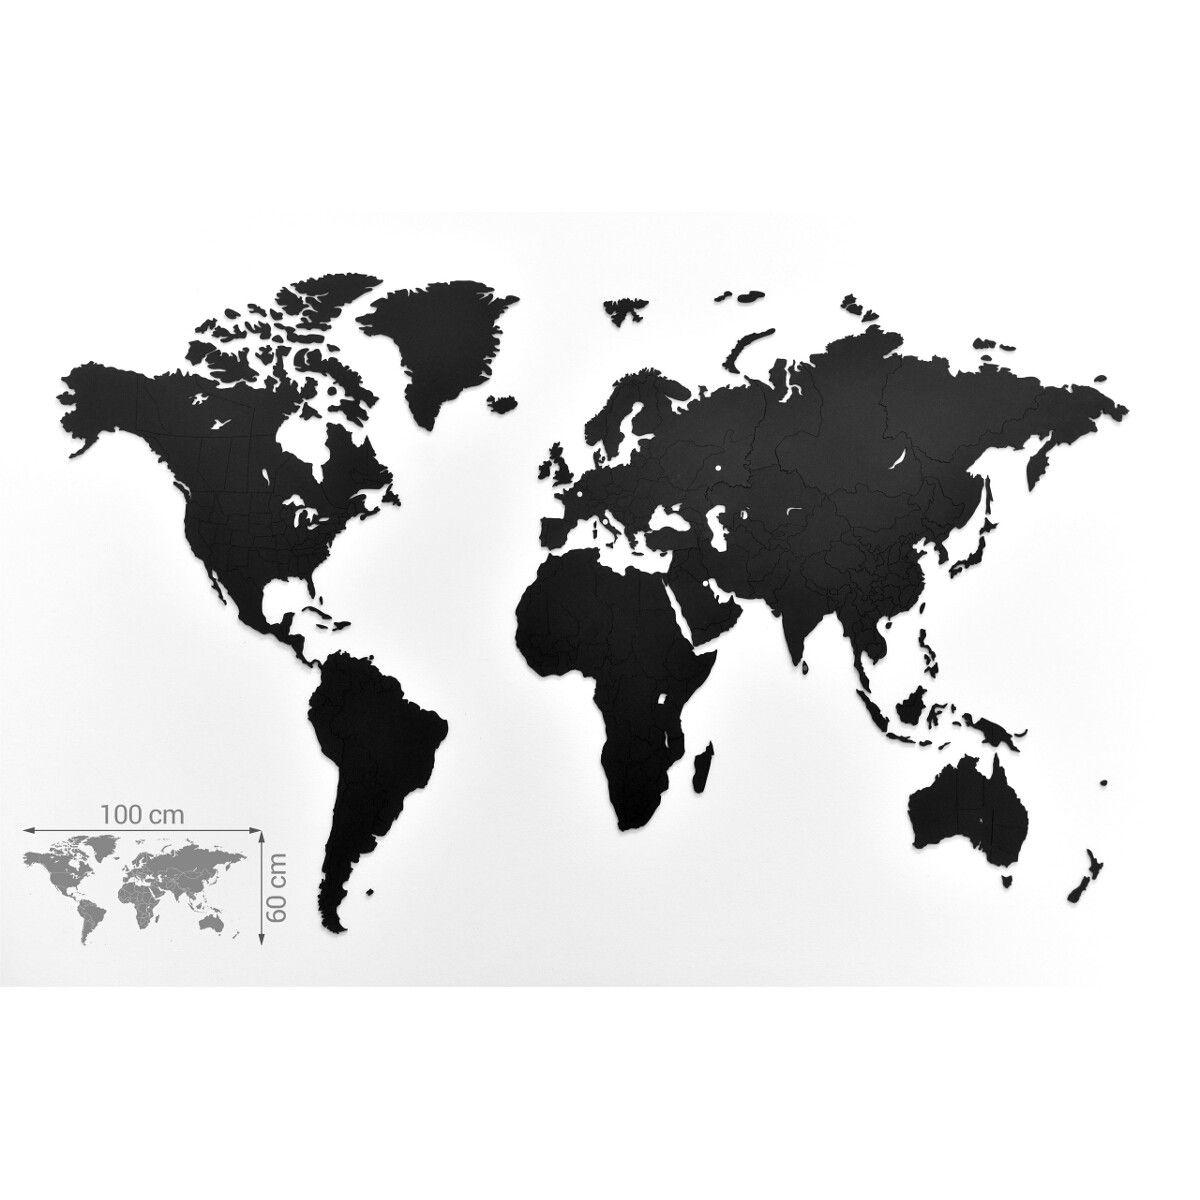 worldmapblankblacklines4500pxmonochromepng 45002234 Maps Pinterest